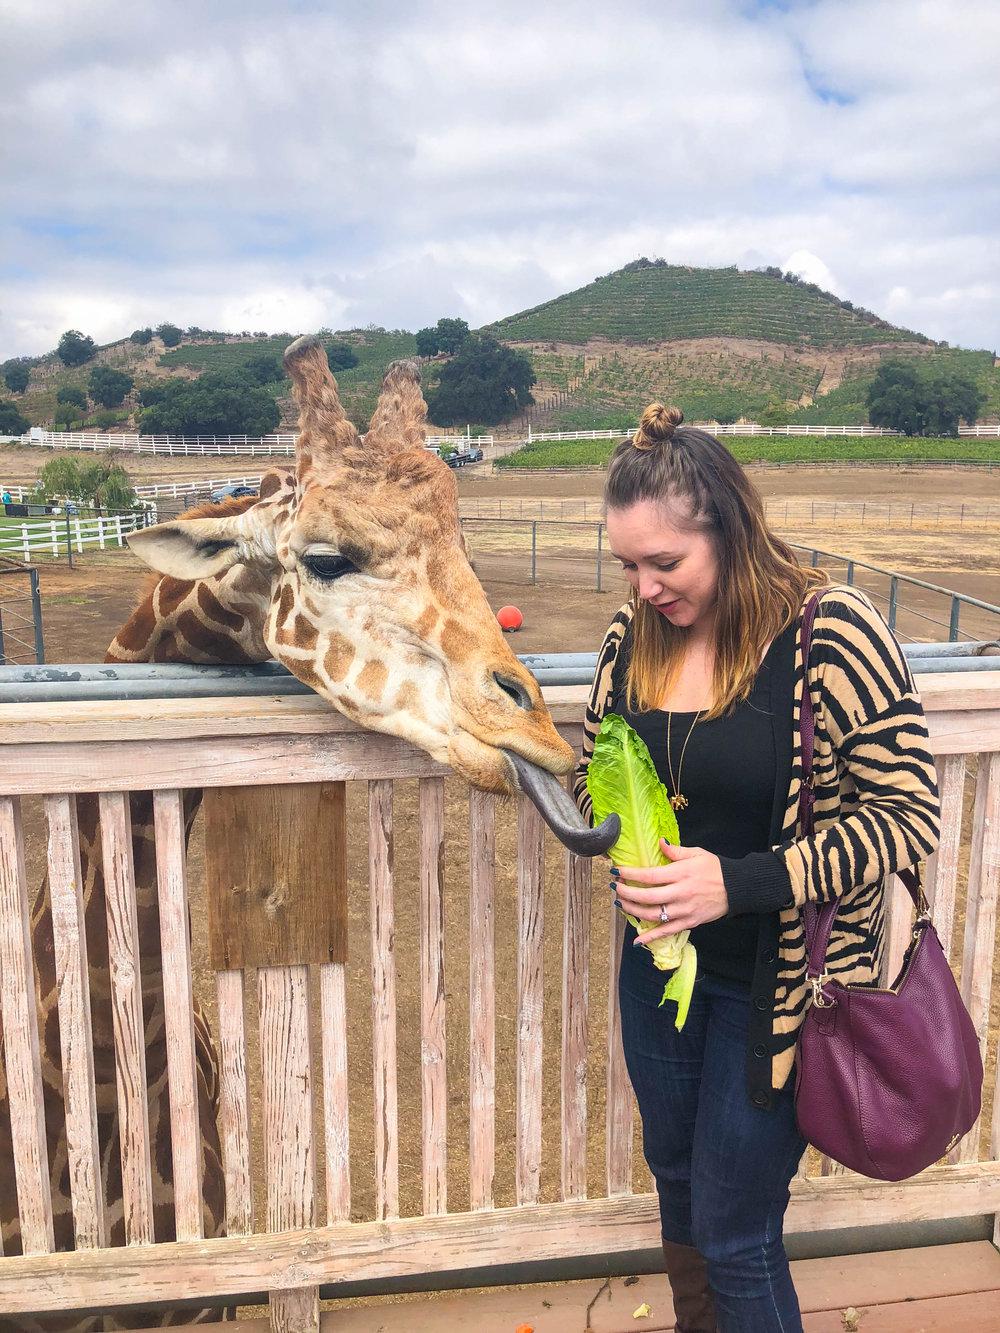 Malibu Wine Safari - Feeding Stanley the Giraffe - Wine Tasting